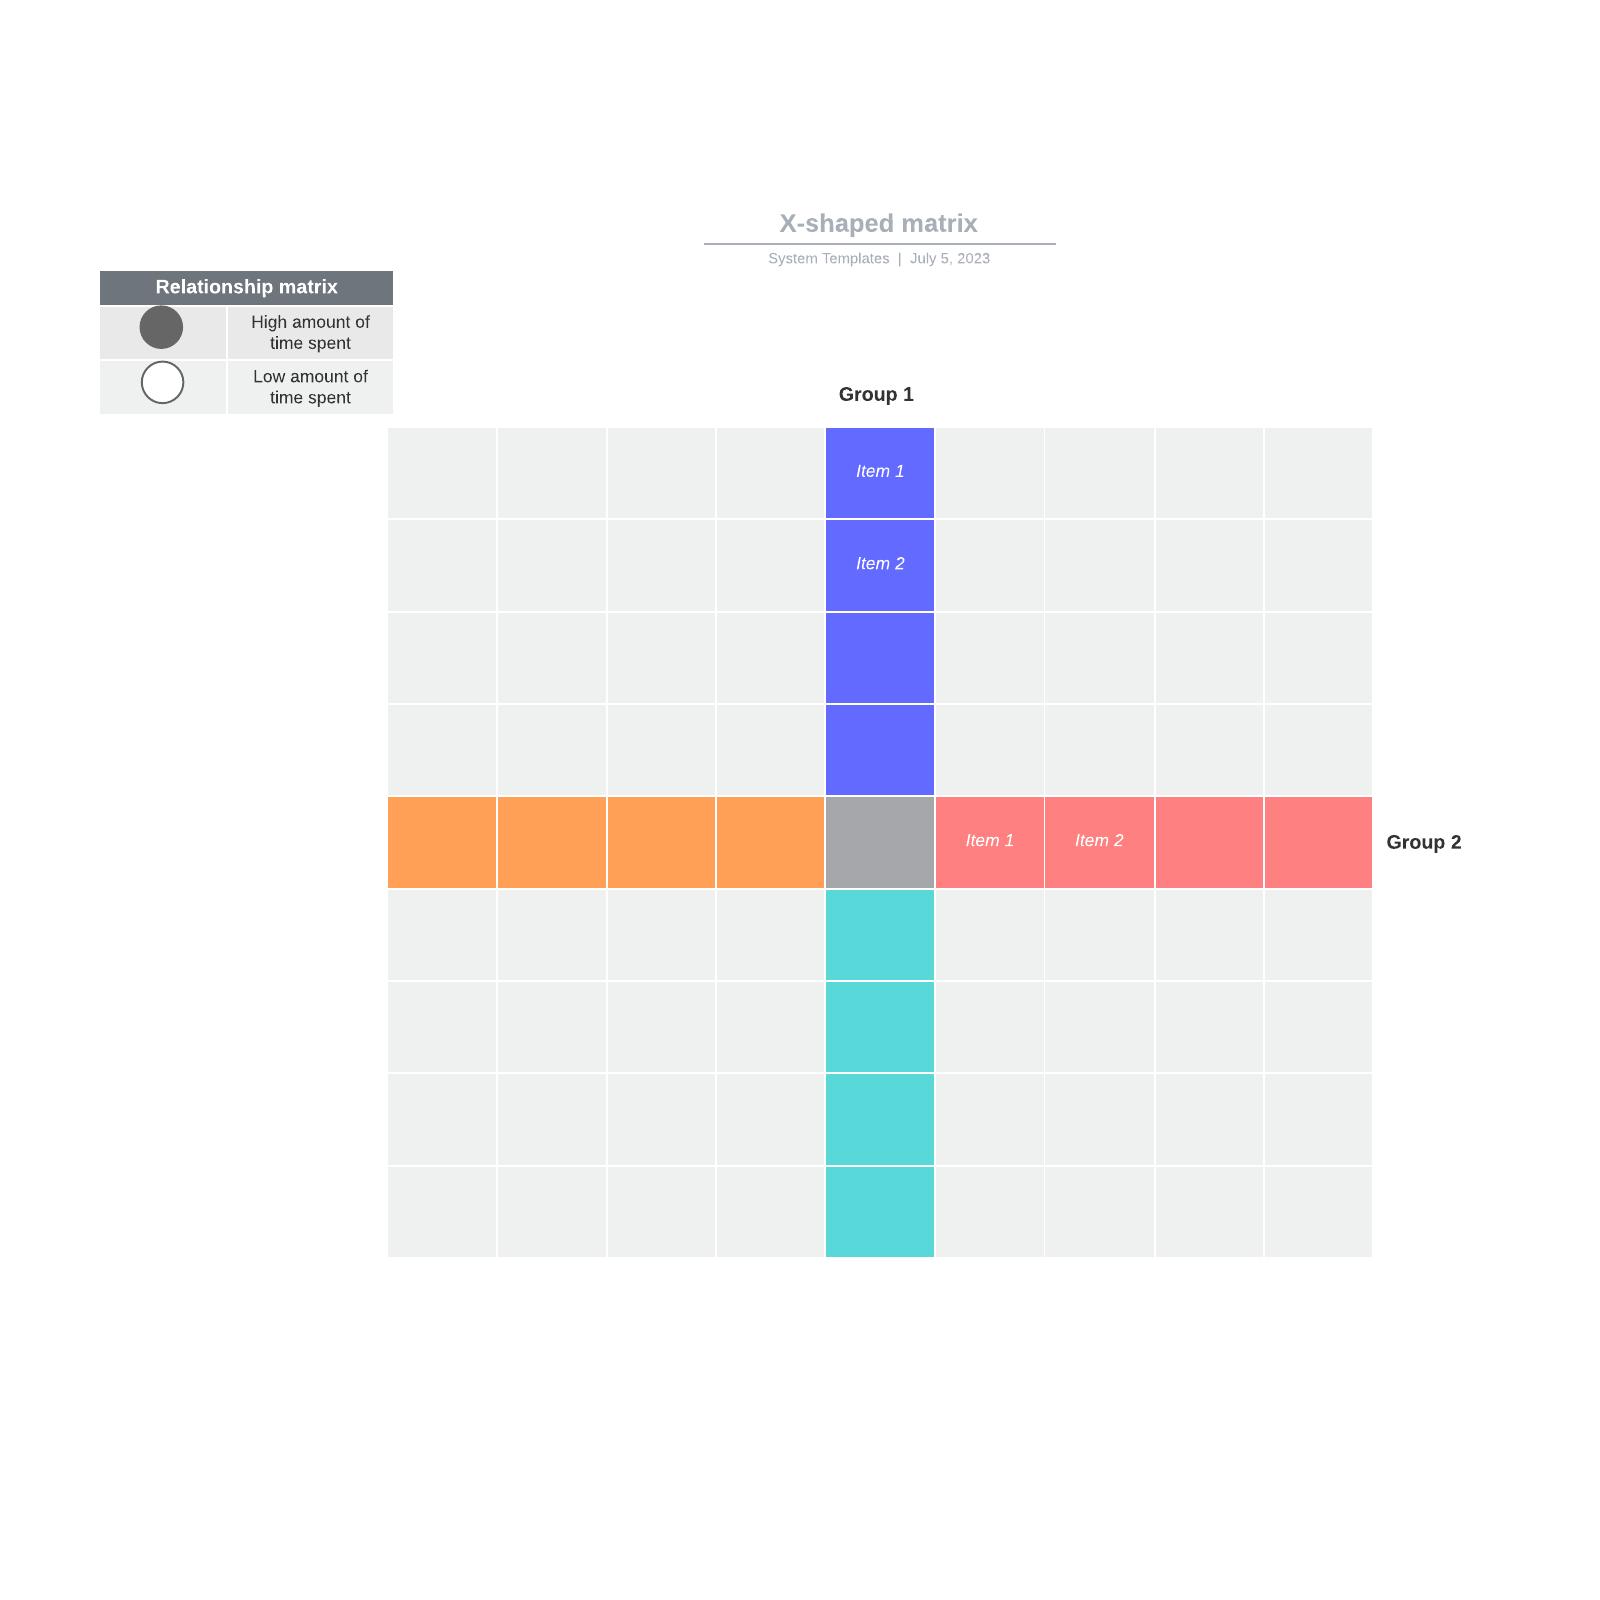 X-shaped matrix